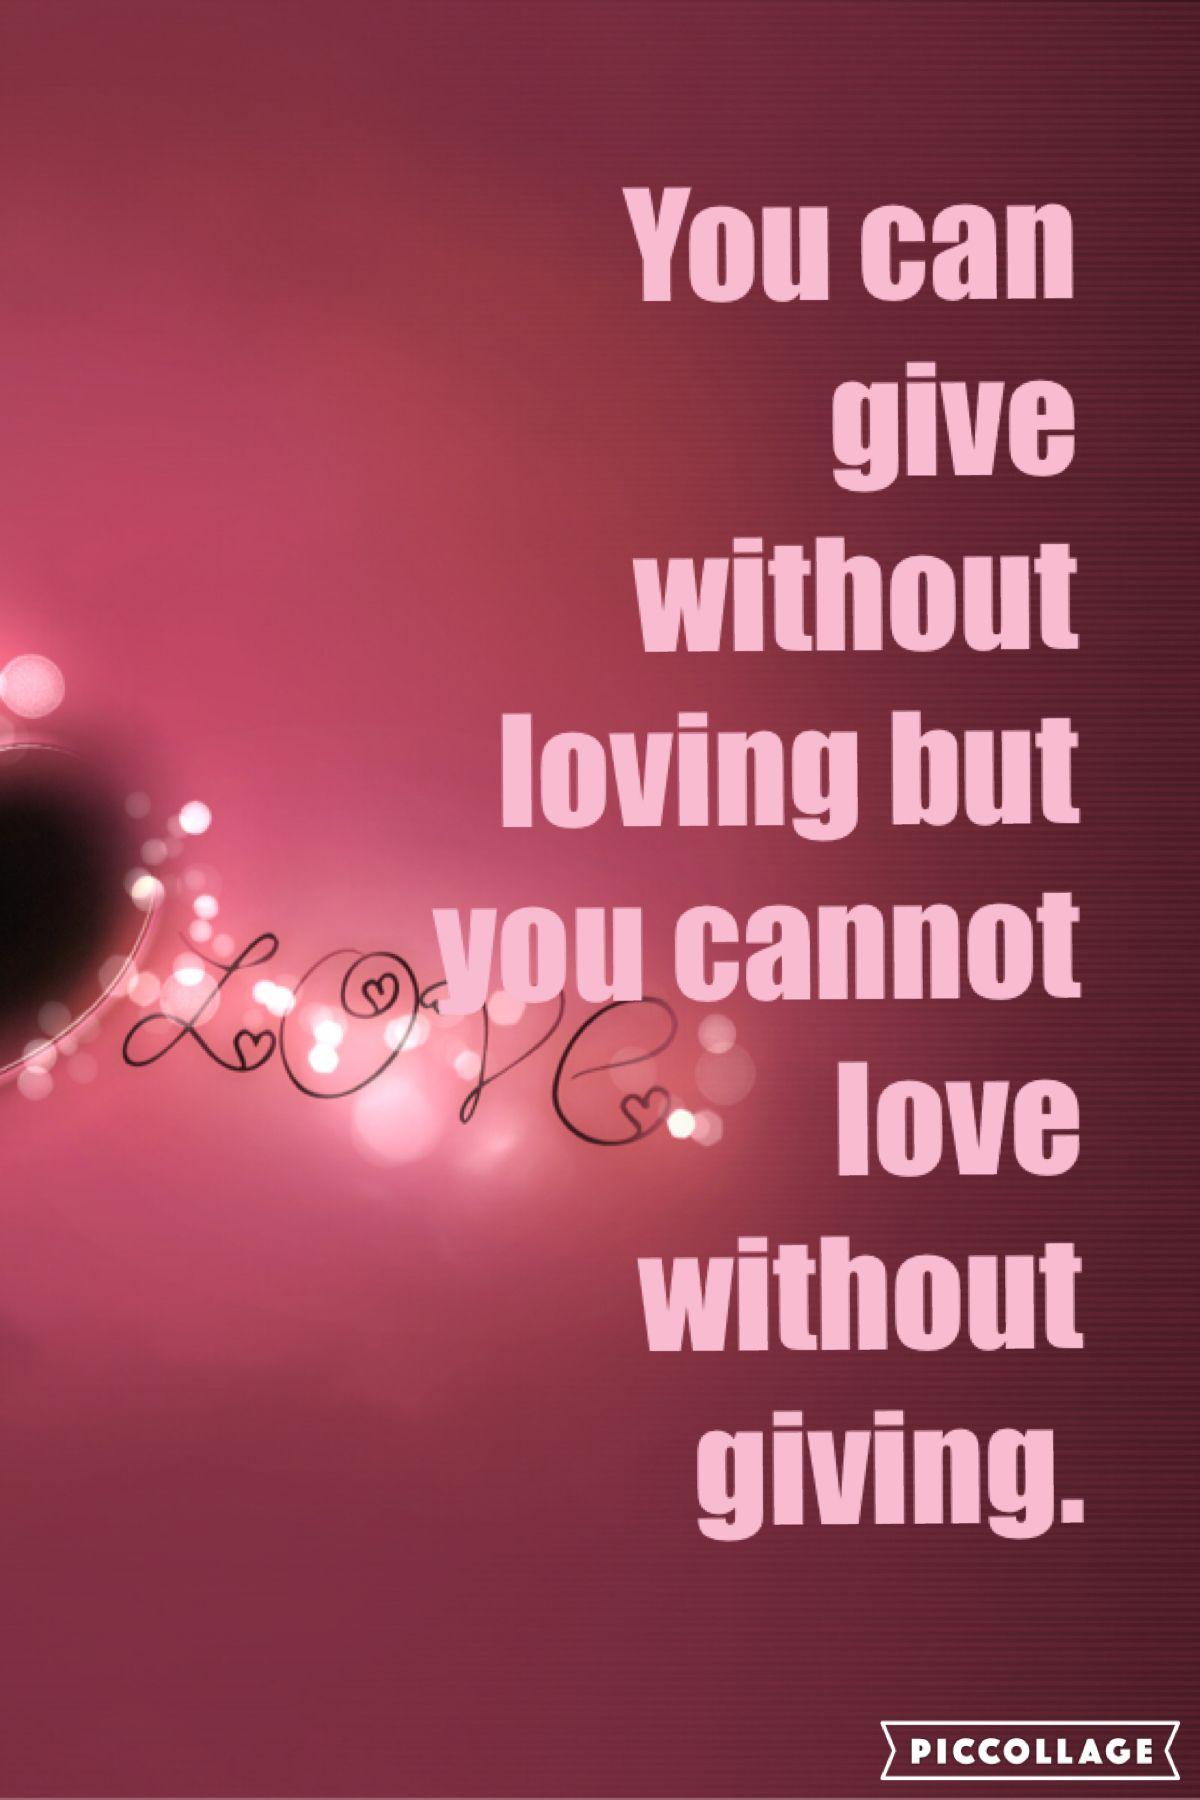 #love #give